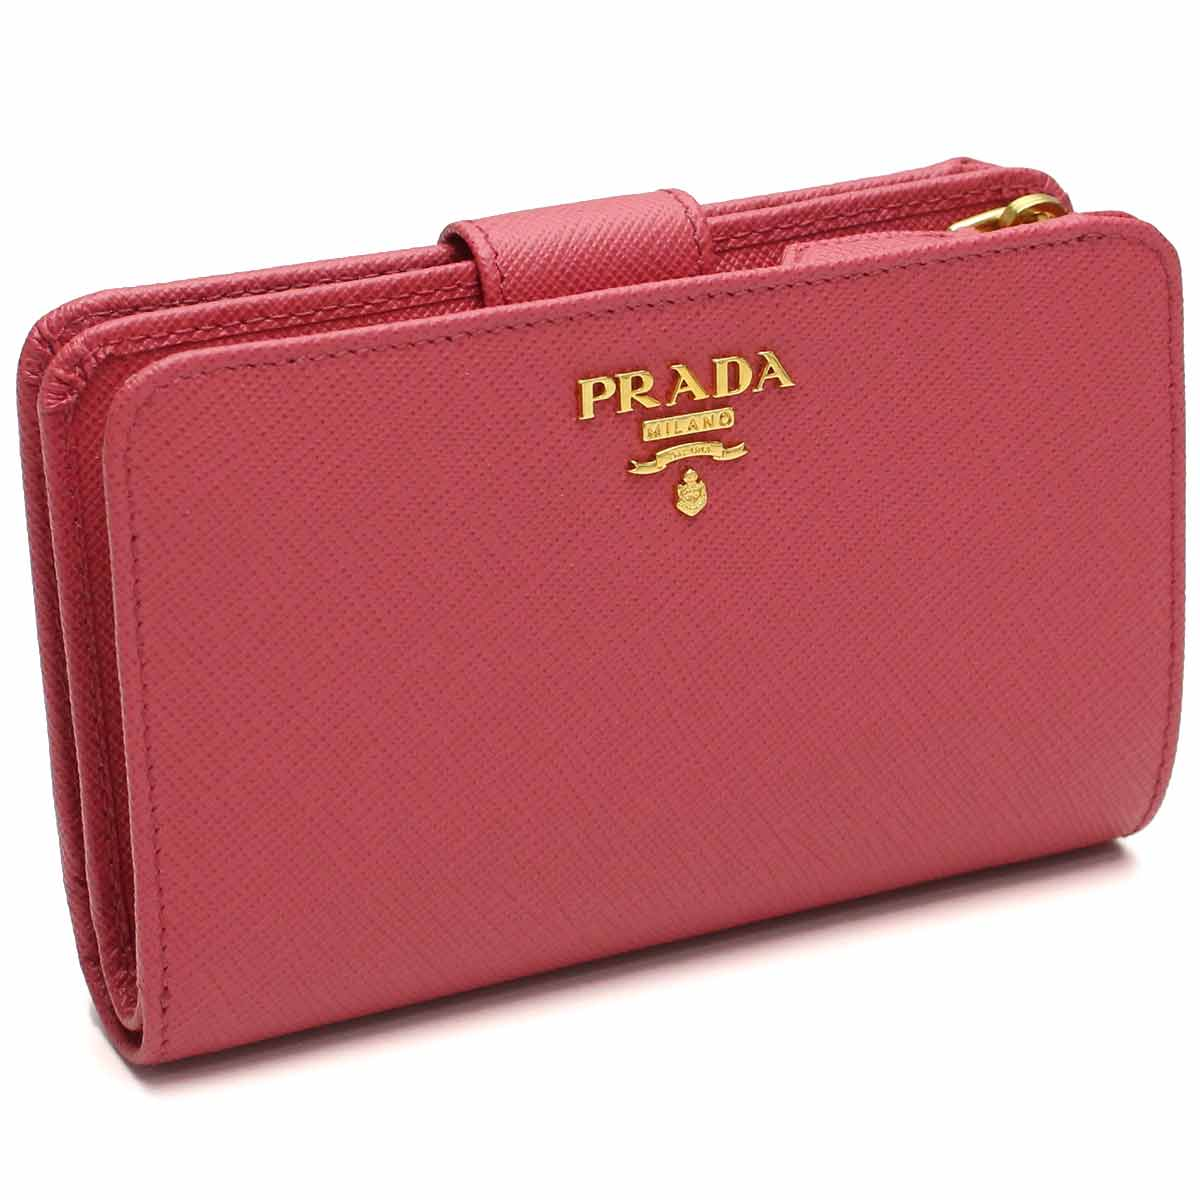 5c9f252dc0a0 ブランド品卸 / プラダ PRADA 財布 二折財布 小銭入れ付き 1ML225 QWA F0505 PEONIA ピンク系 レディース